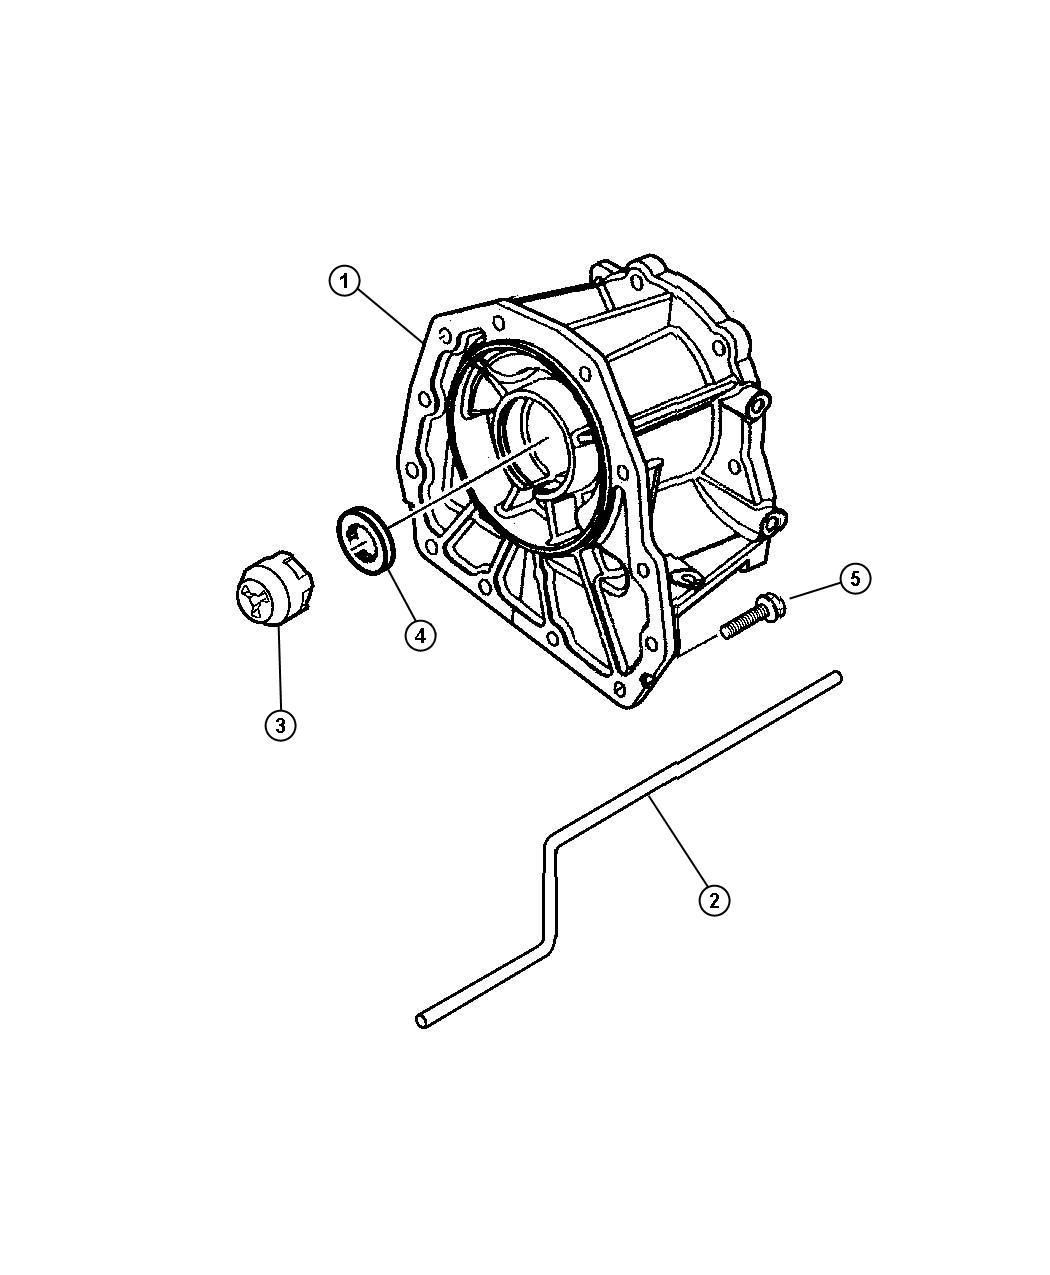 Dodge Dakota Adapter. Transfer case. Transmission, spd